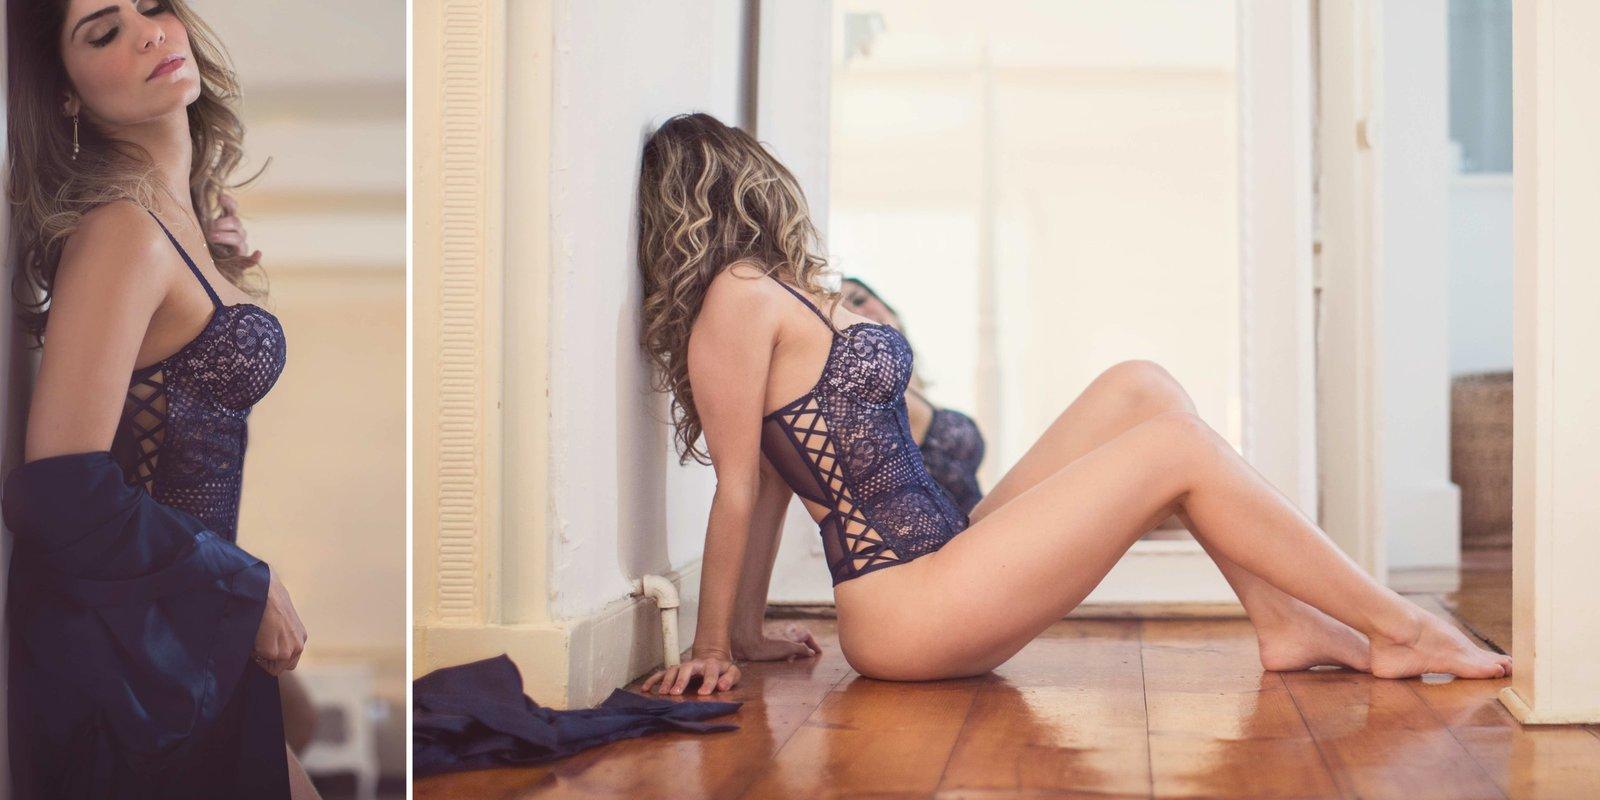 boston_saratoga_springs_boudoir_intimate_studio_photographer004